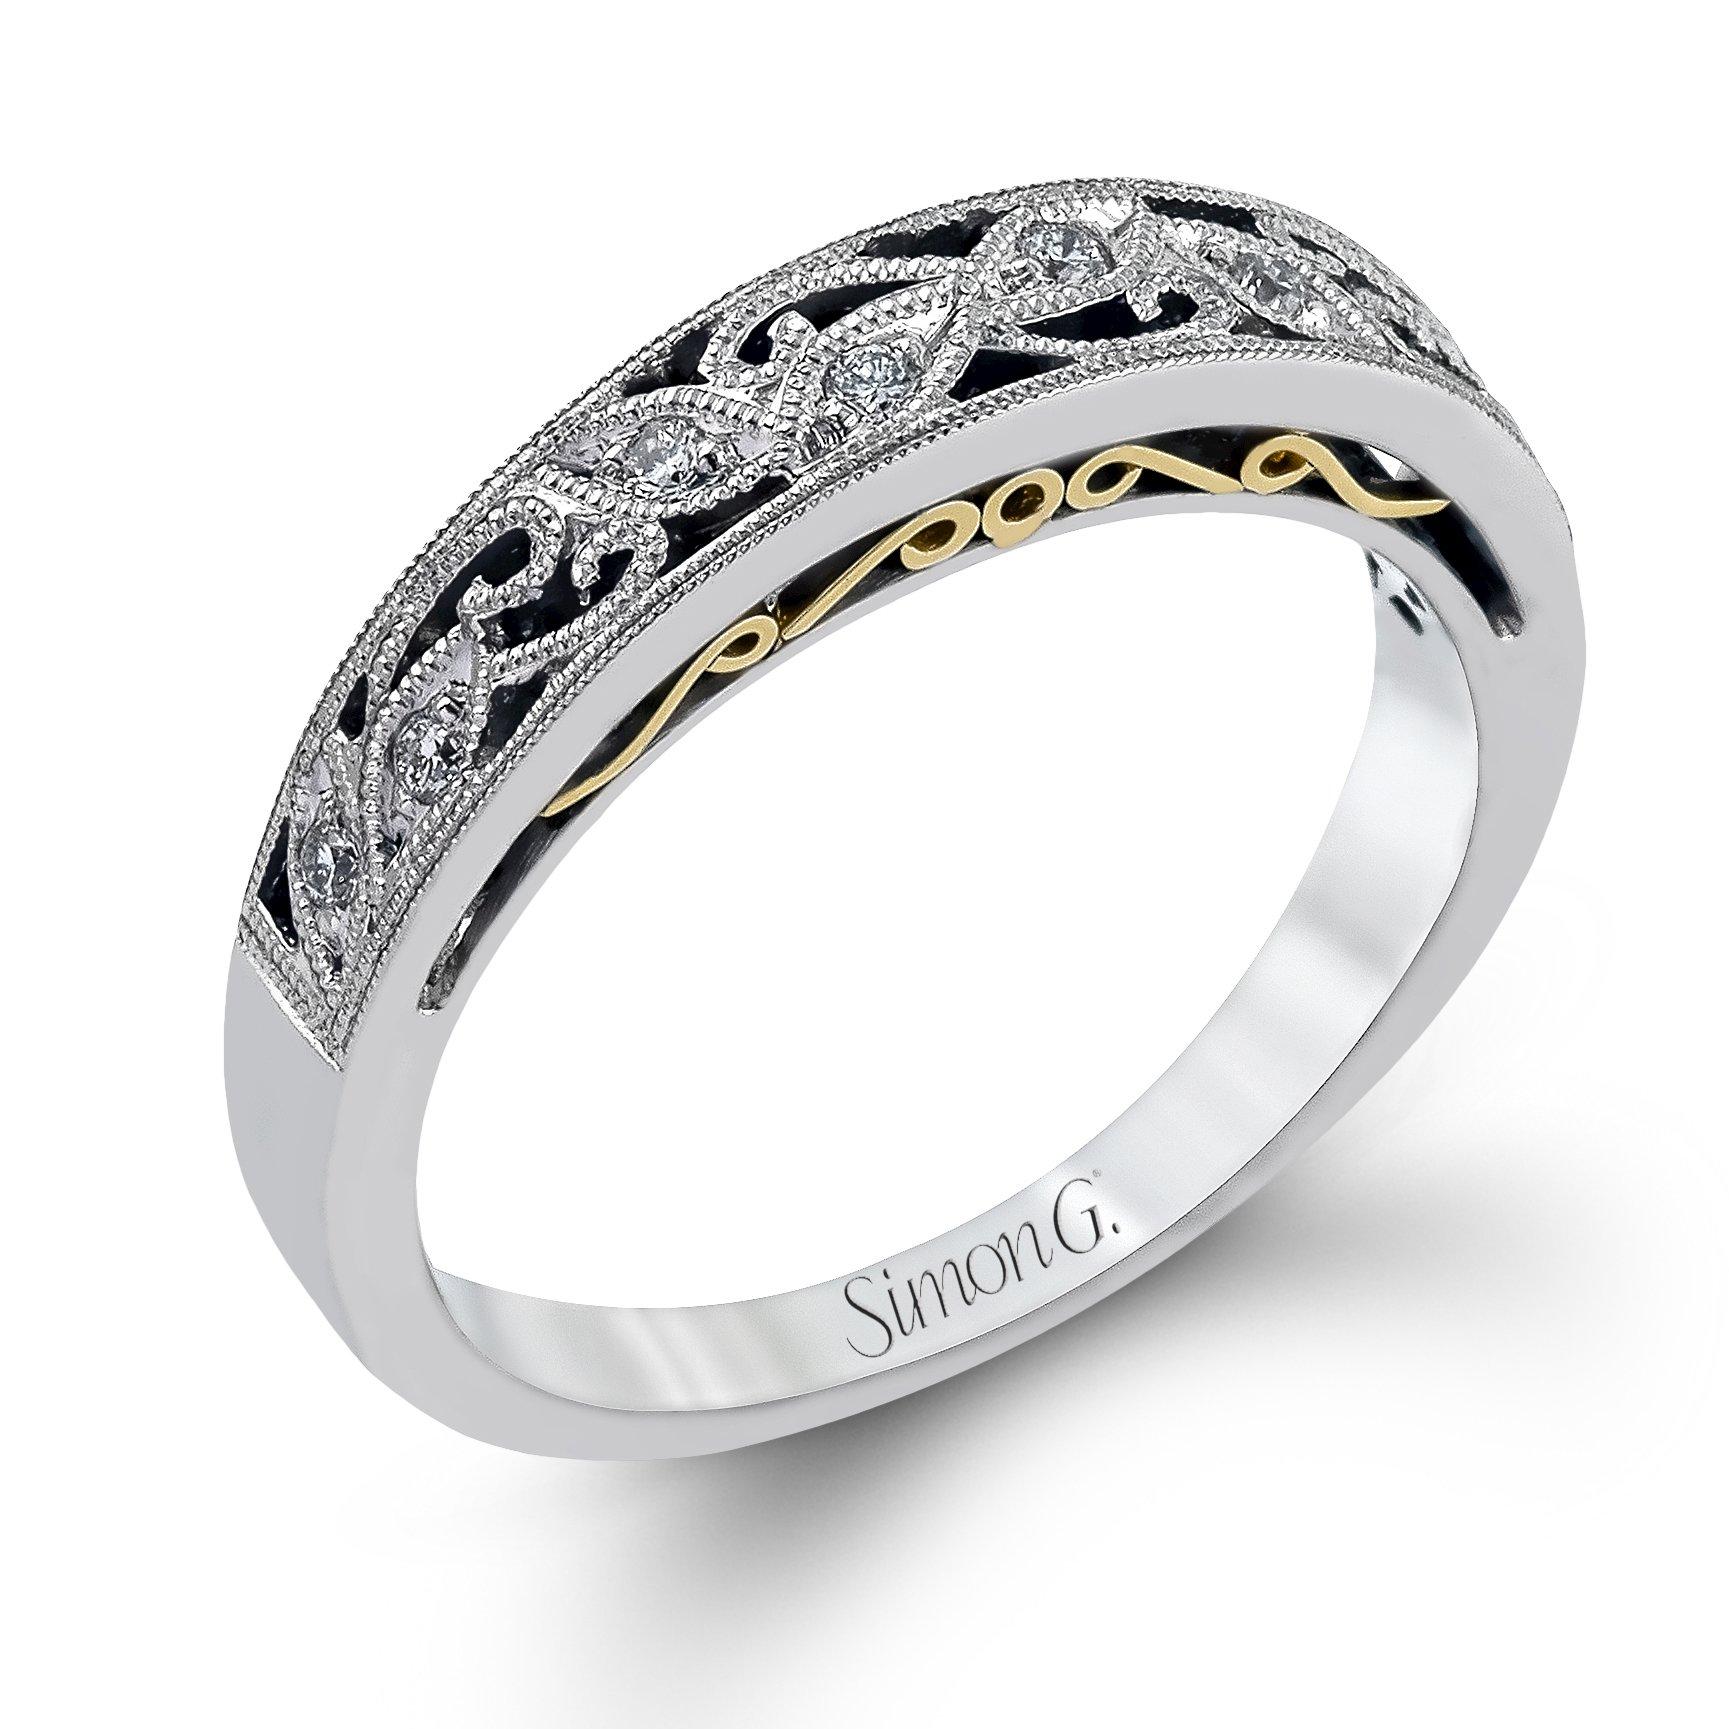 It is a graphic of Simon G LP50B diamond womens wedding band